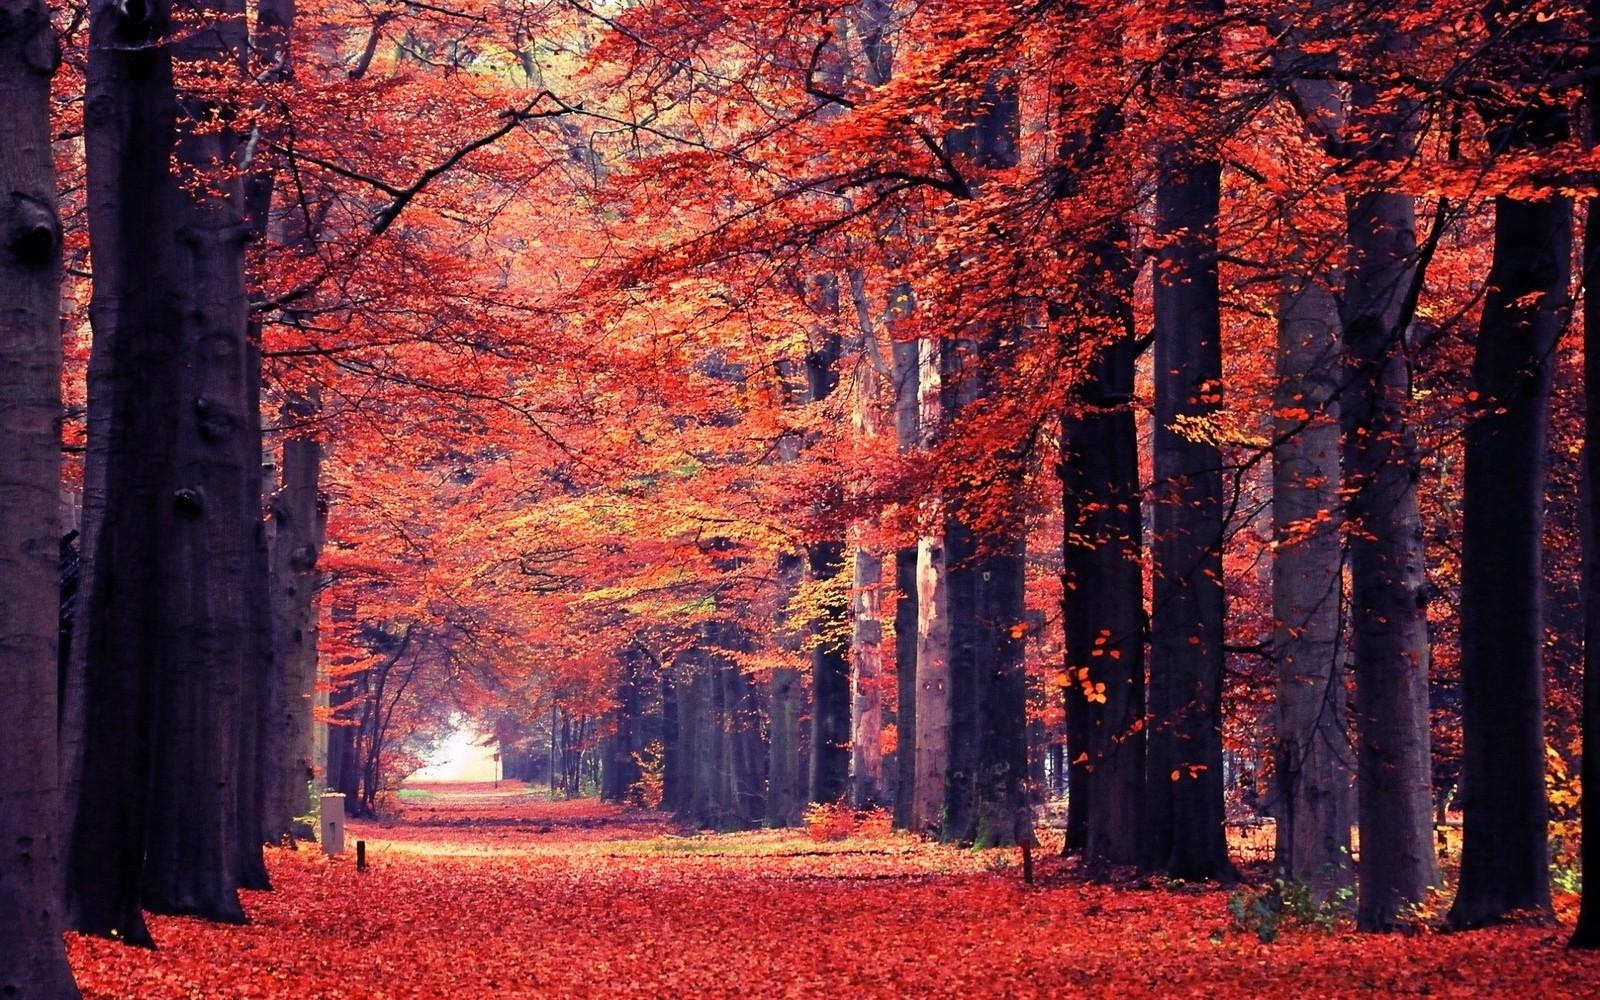 Fall Landscape Wallpaper Desktop Nature Landscape Fall Leaves Path Trees Park Tunnel